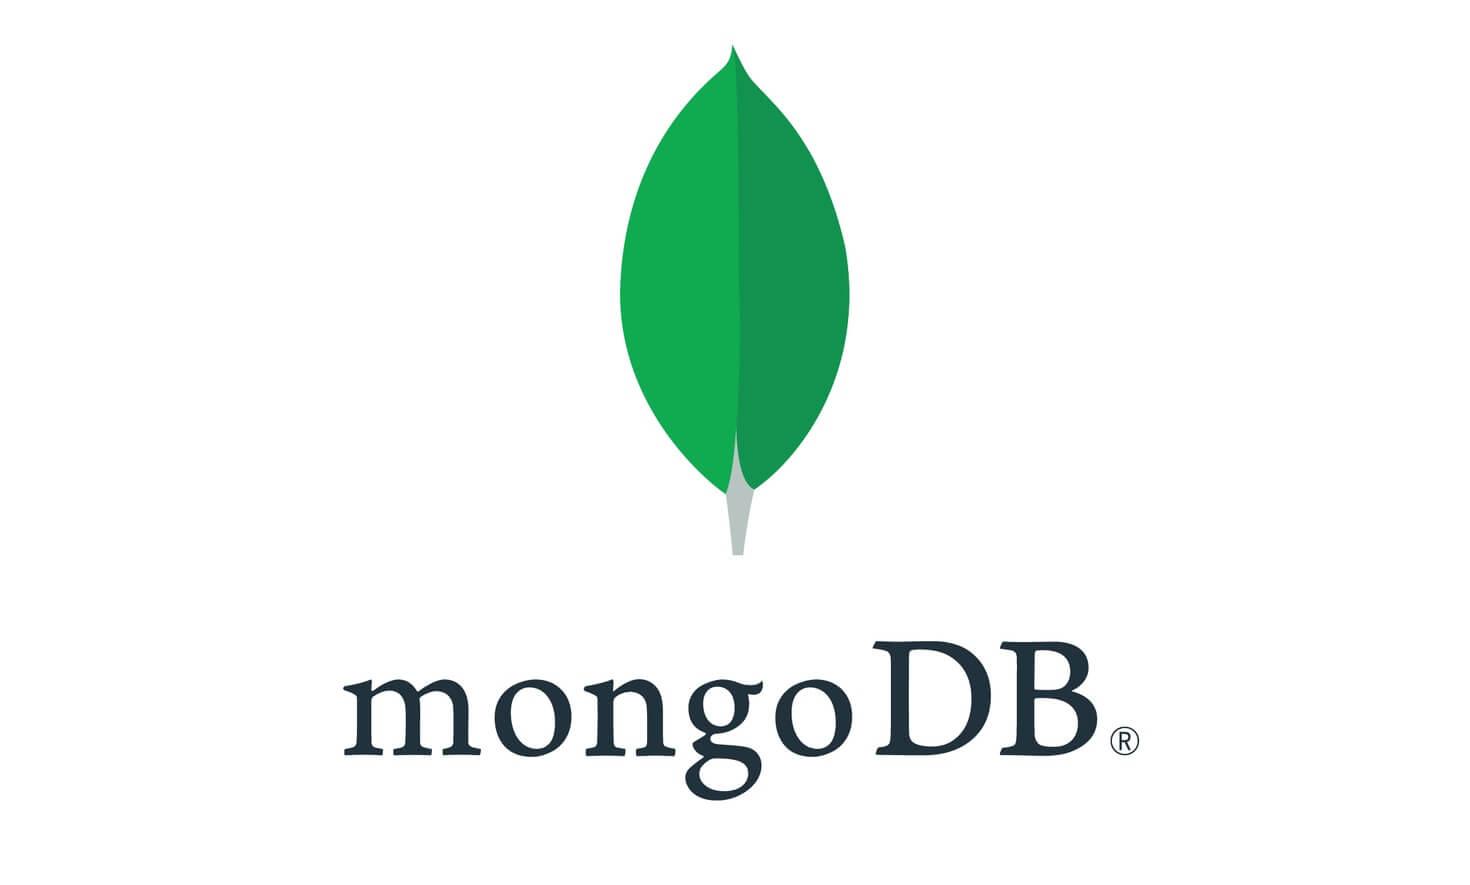 mongodb-atlas-google-cloud-partnership-nosql-databases-integrations-2 (1).jpg